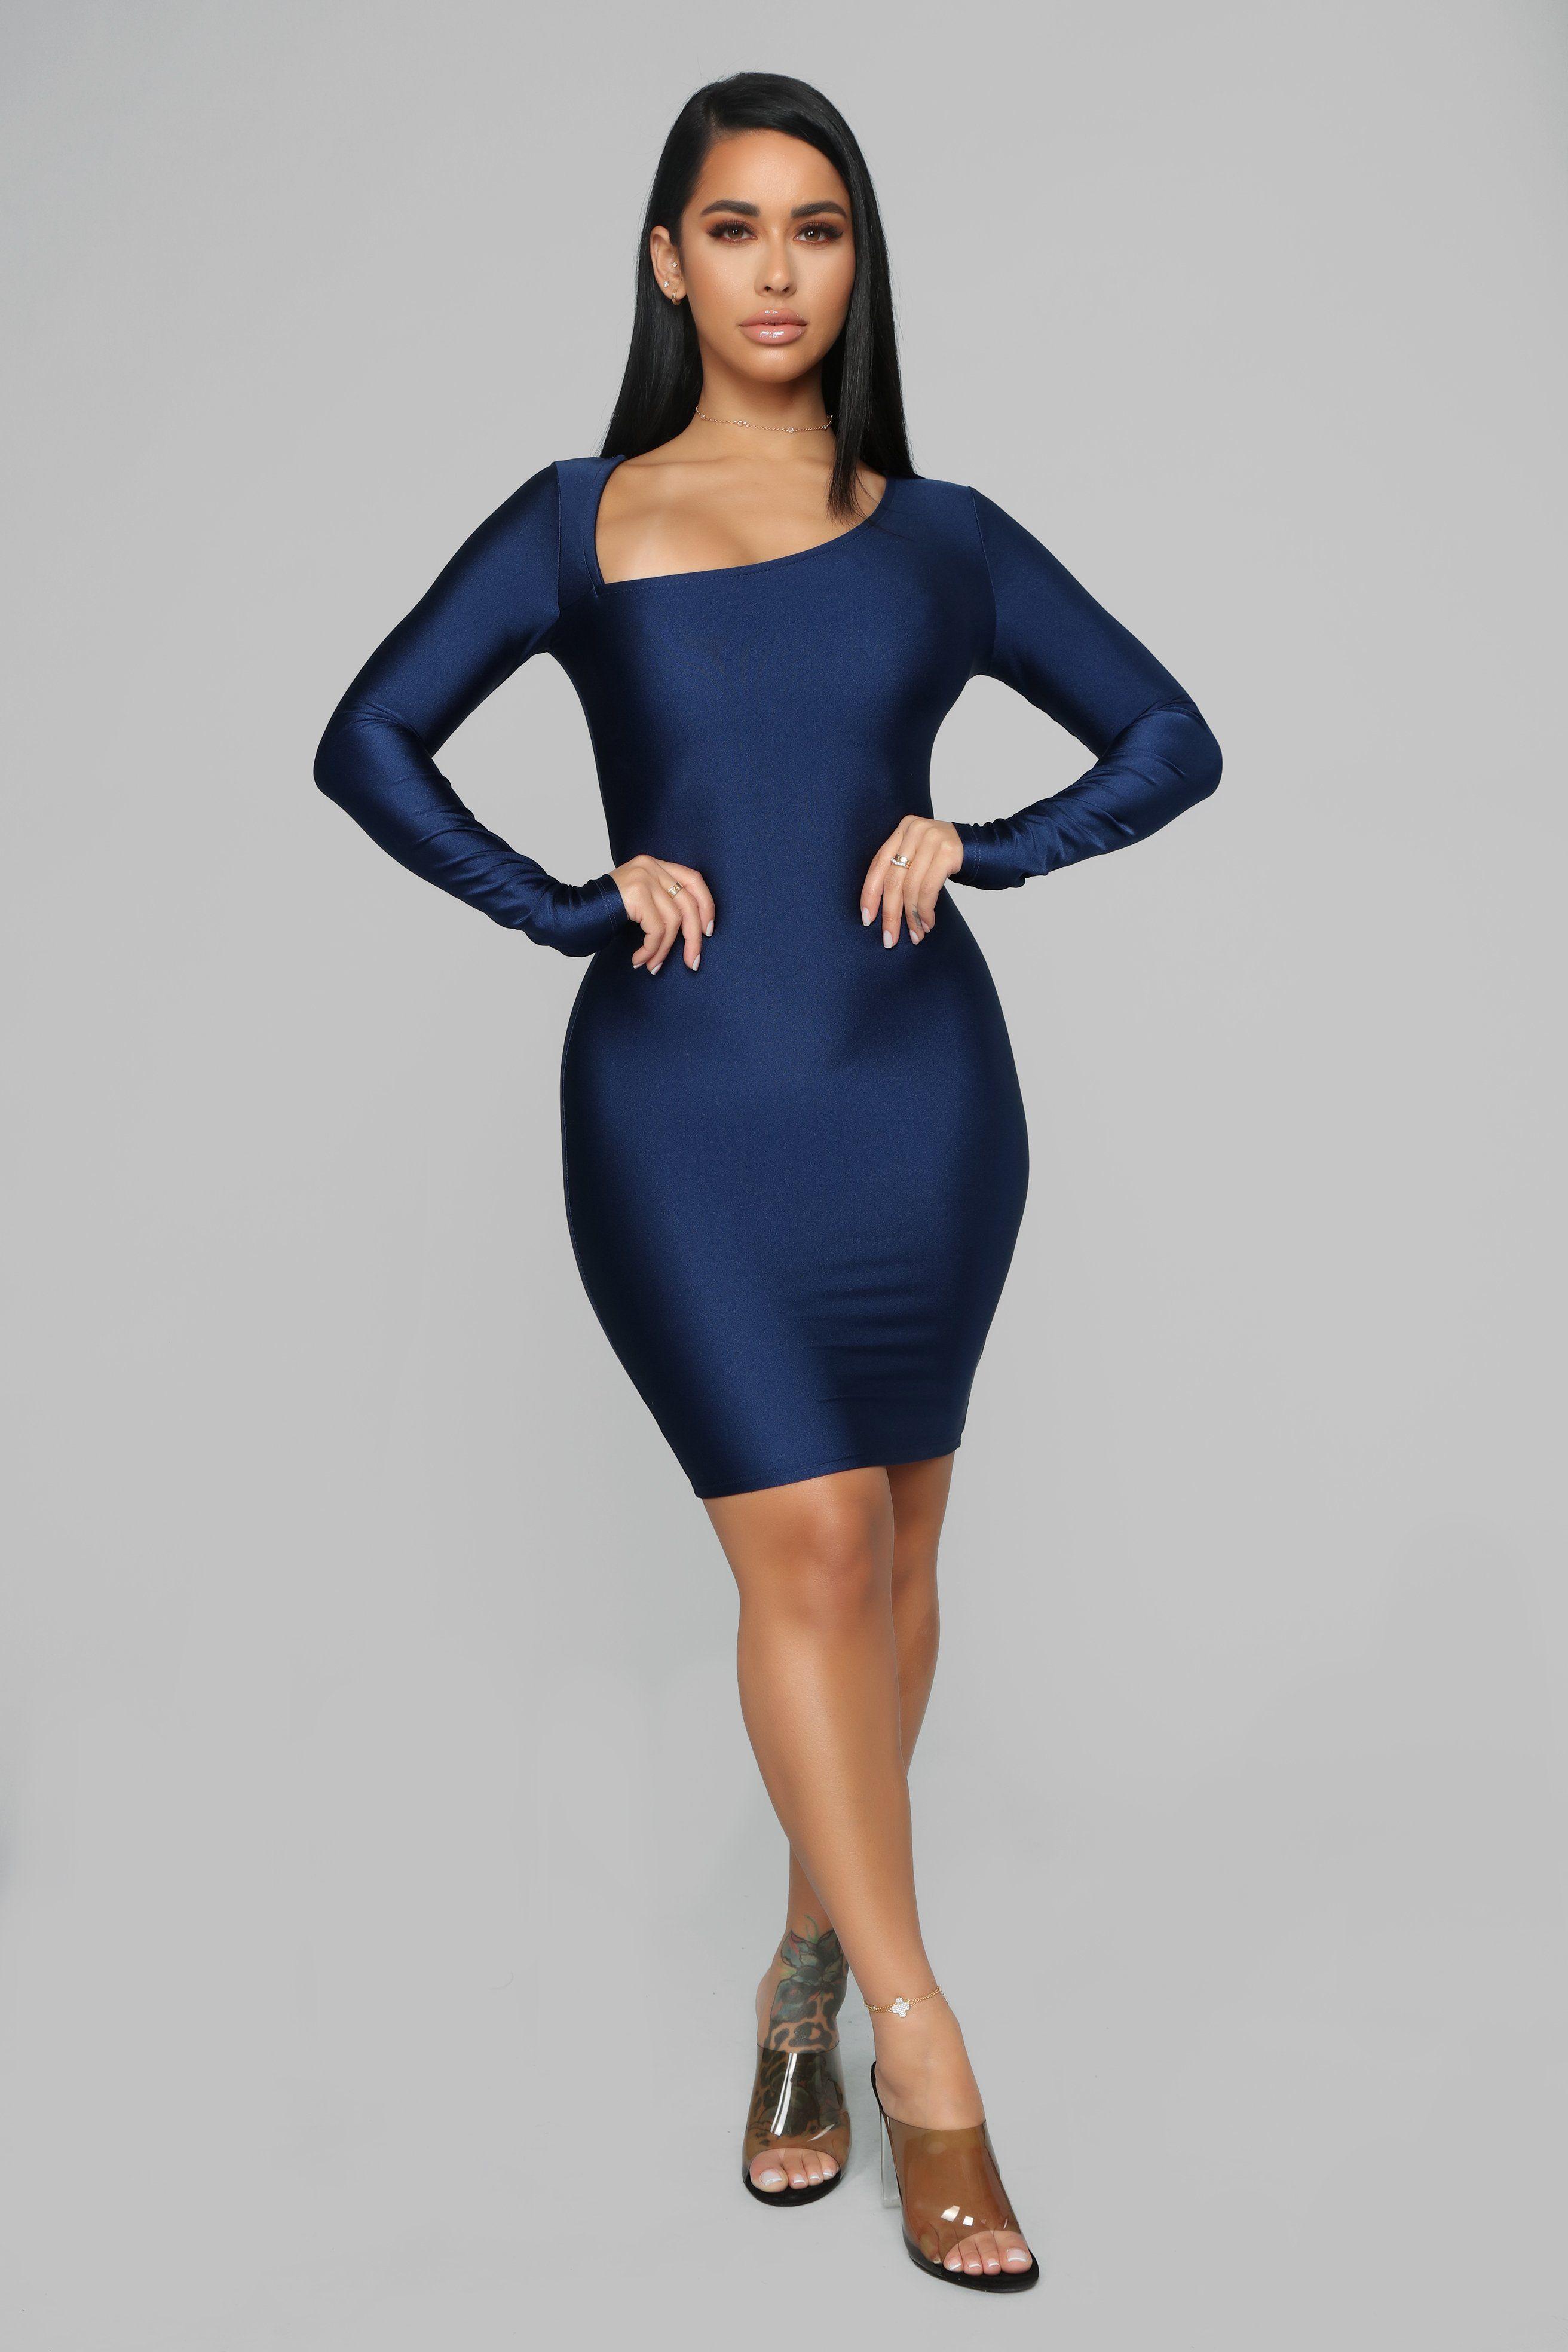 Get Me Bodied Mini Dress Navy Dresses, Mini dress